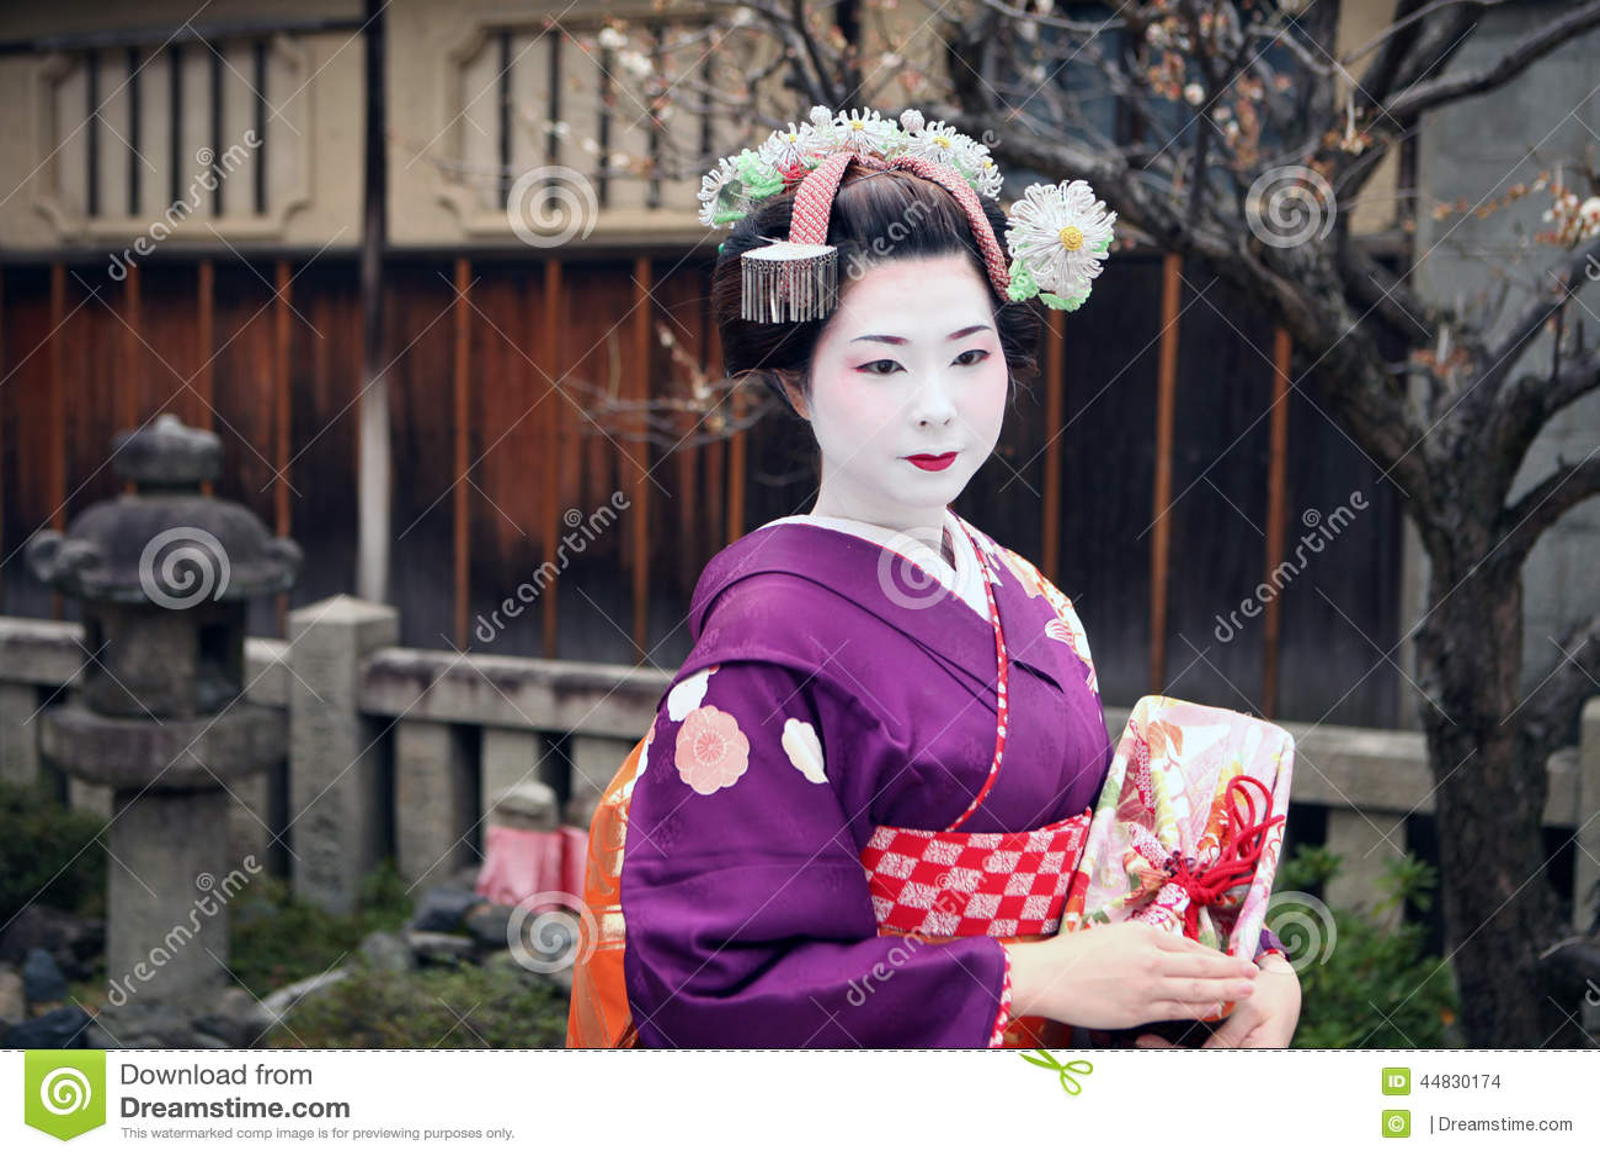 Traditional geisha dances in japan